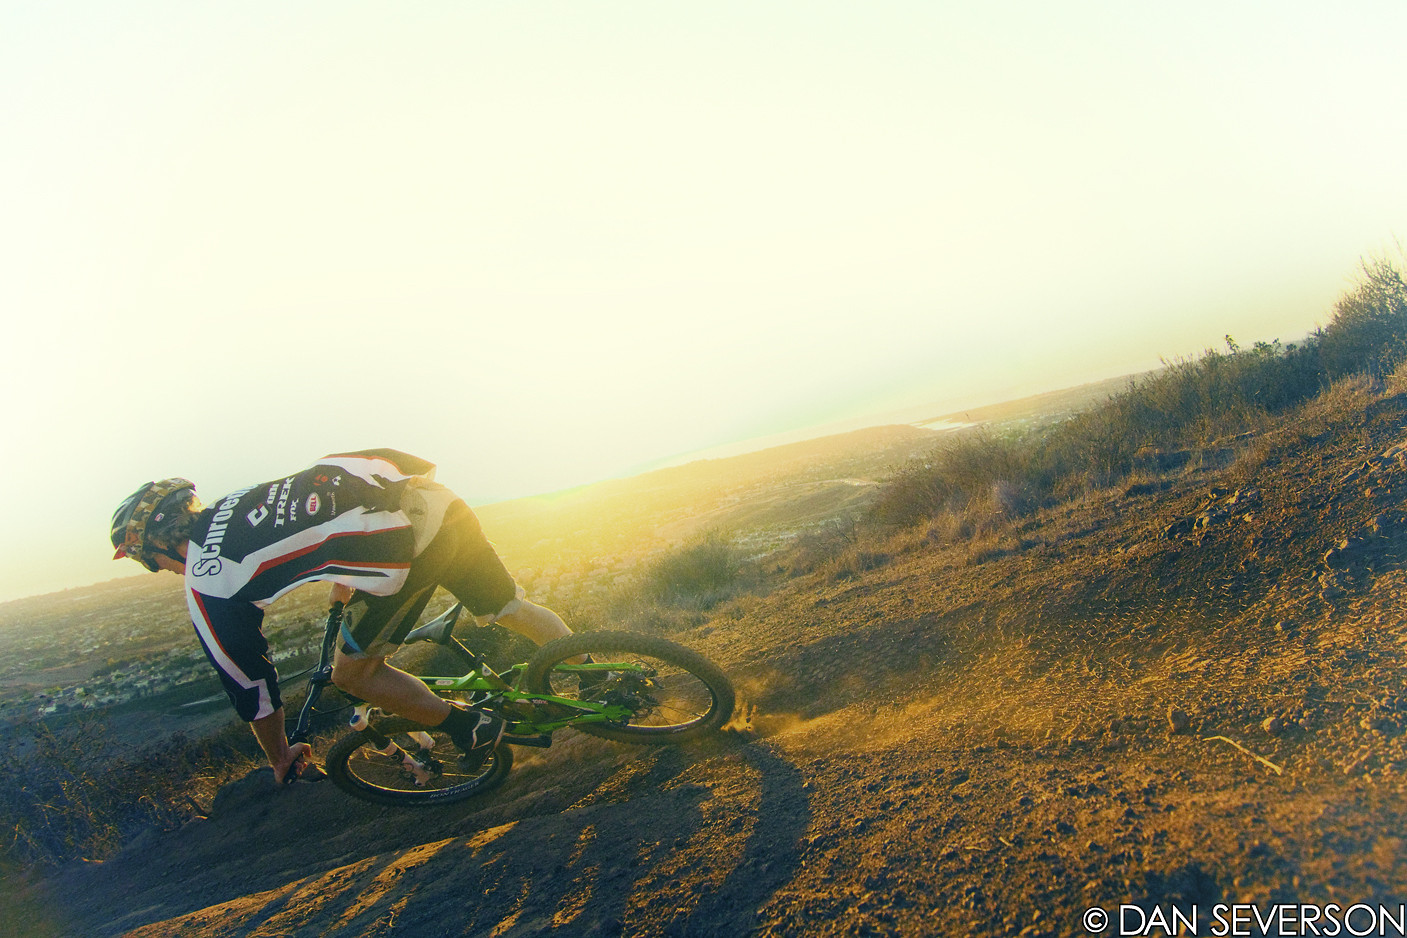 Evening trail shredding  - danseverson photo - Mountain Biking Pictures - Vital MTB